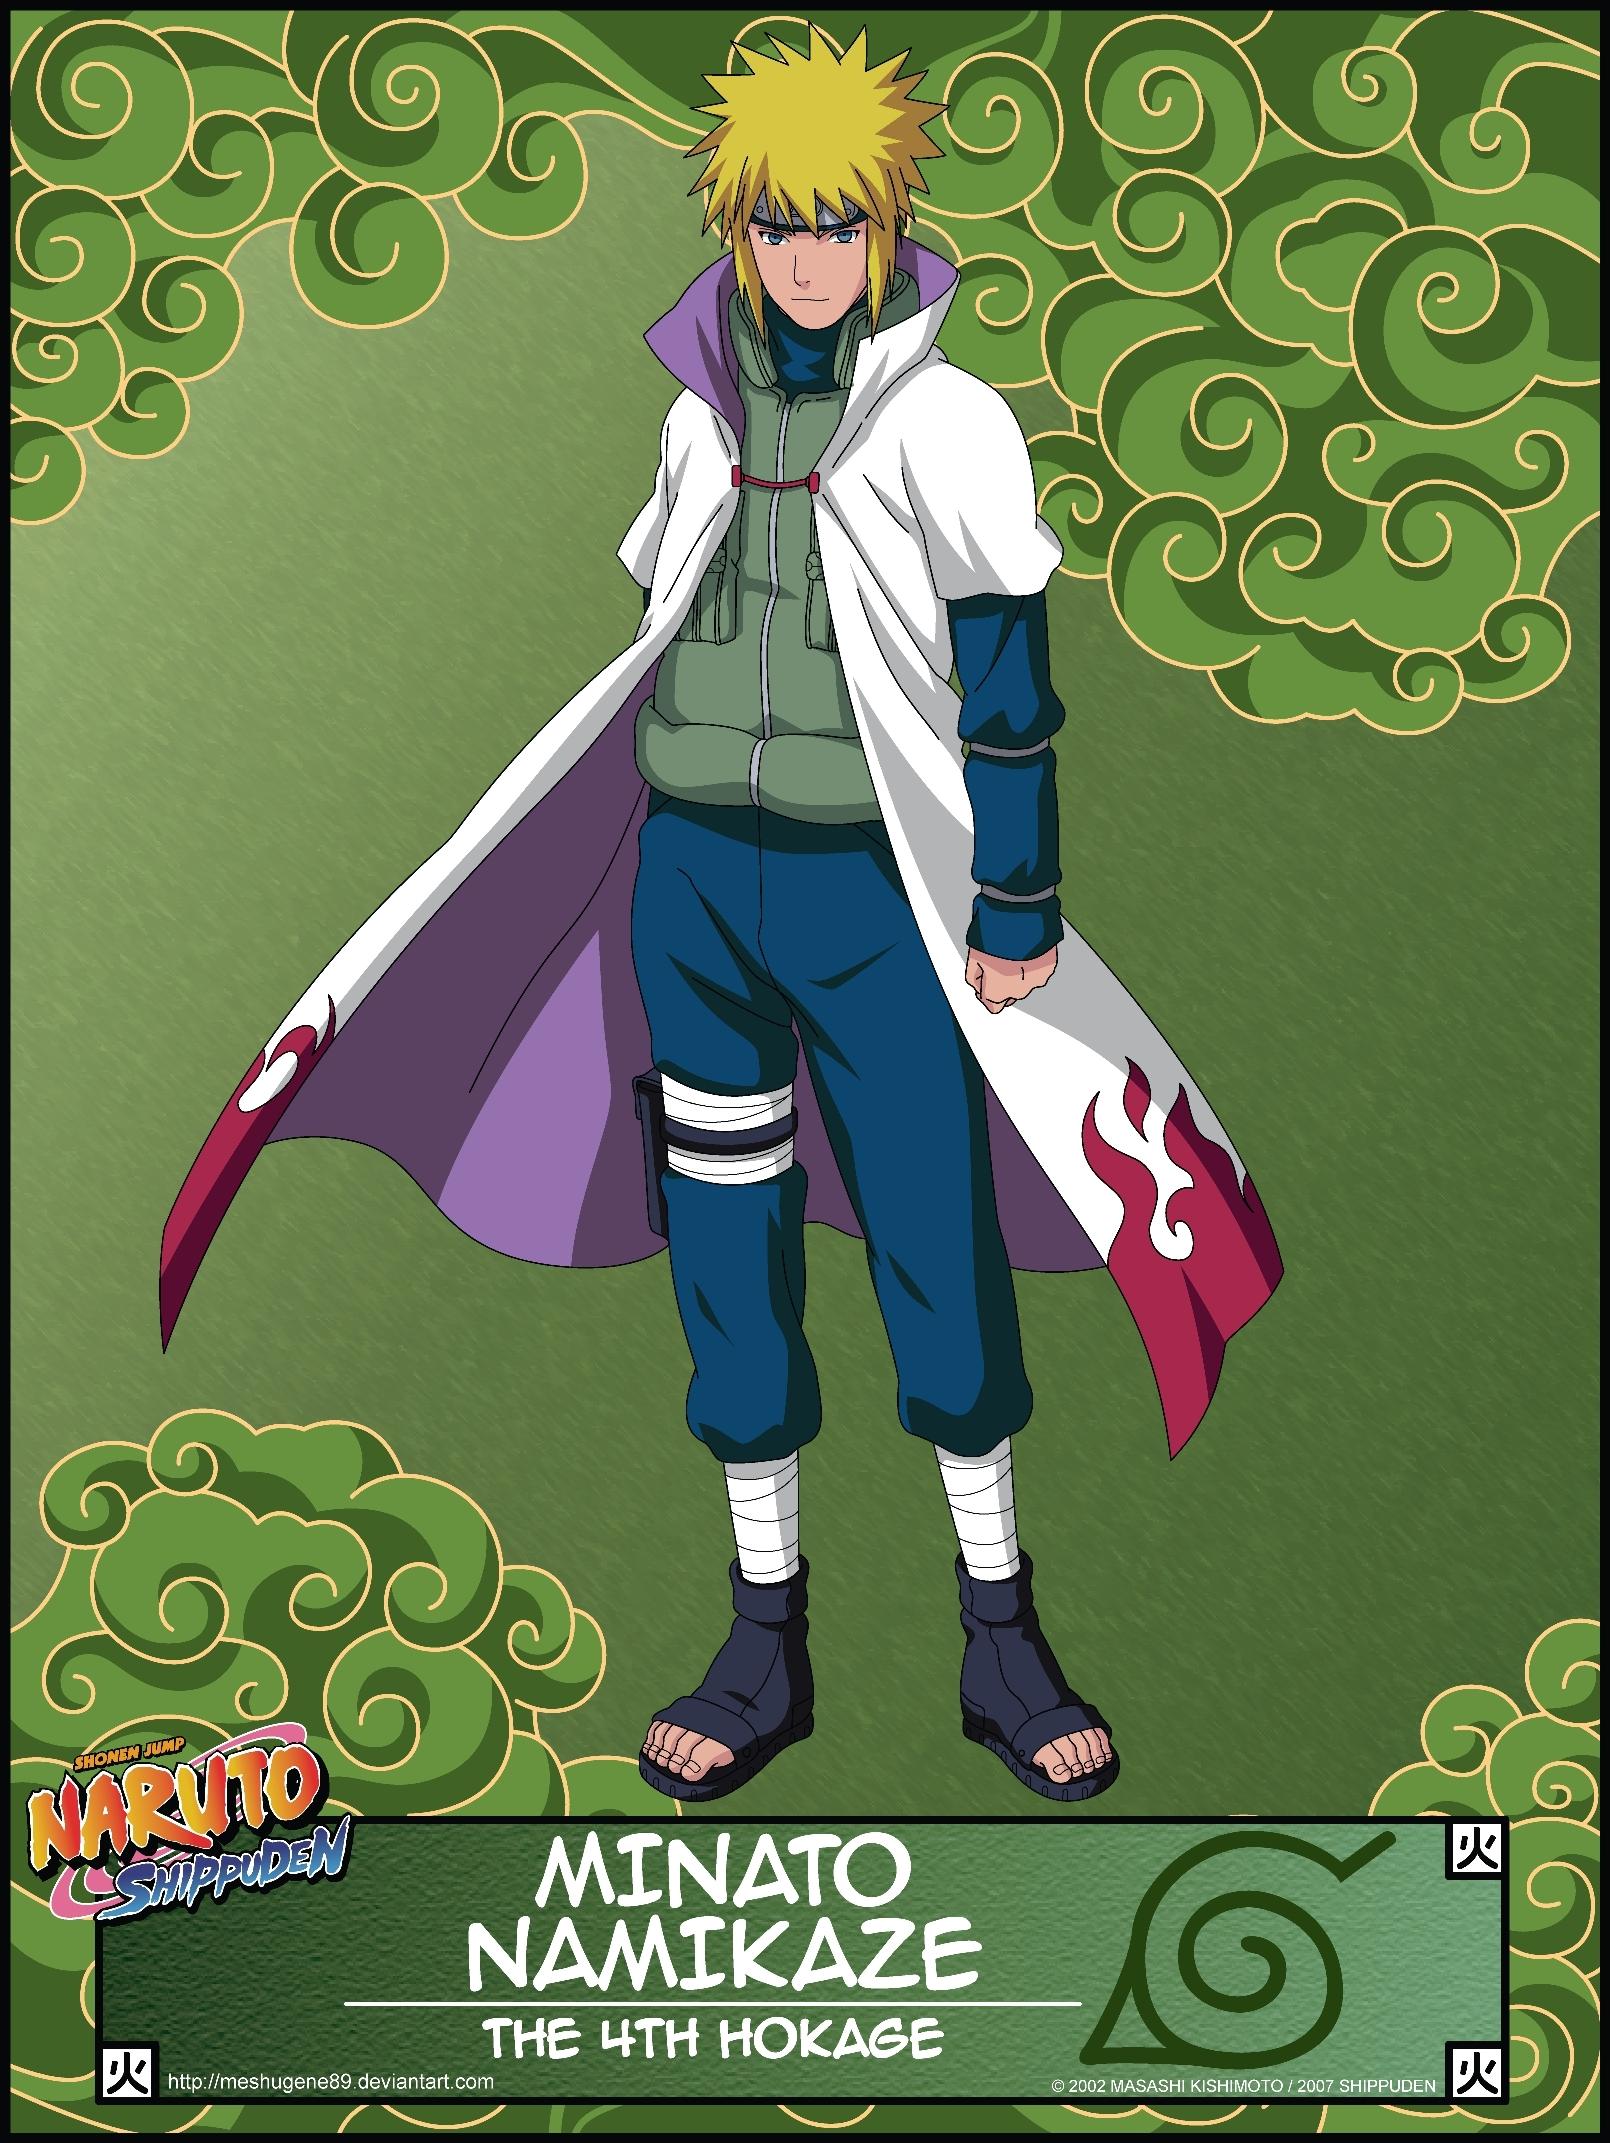 Kumpulan 500 Gambar Naruto HD Wallpaper Terbaru Gambar Naruto